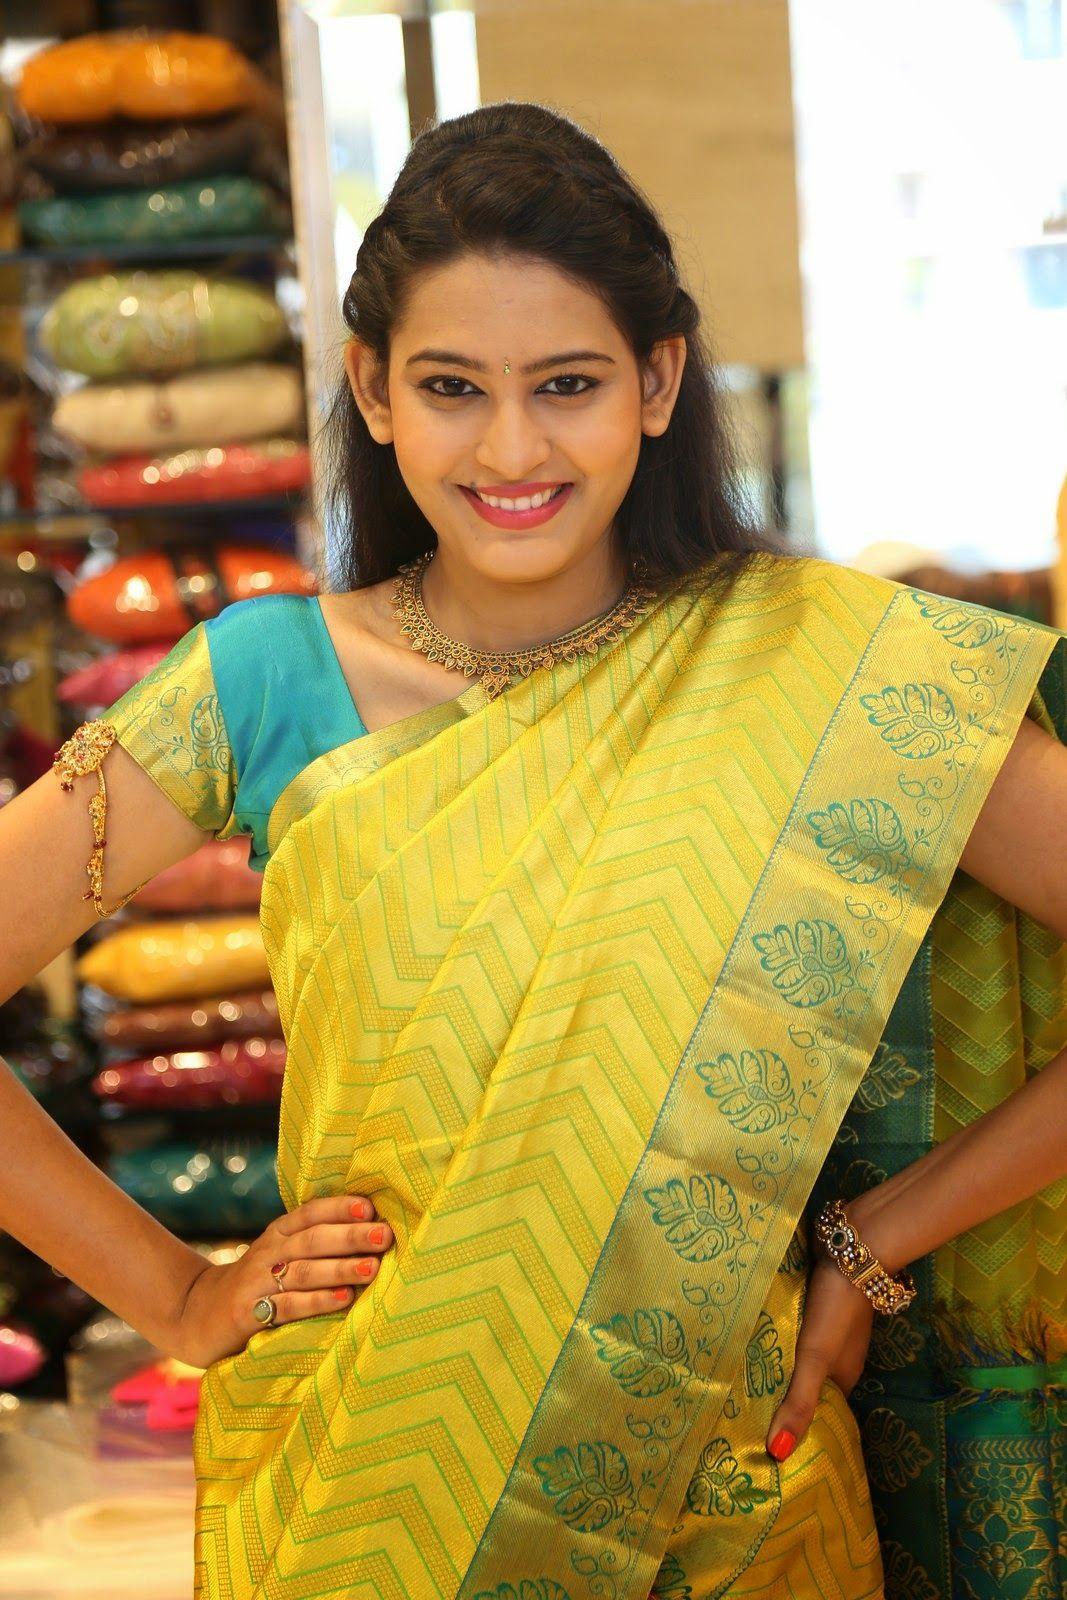 Saree blouse design pattu self patterns on pattu sarees blouse designs  stunning sarees